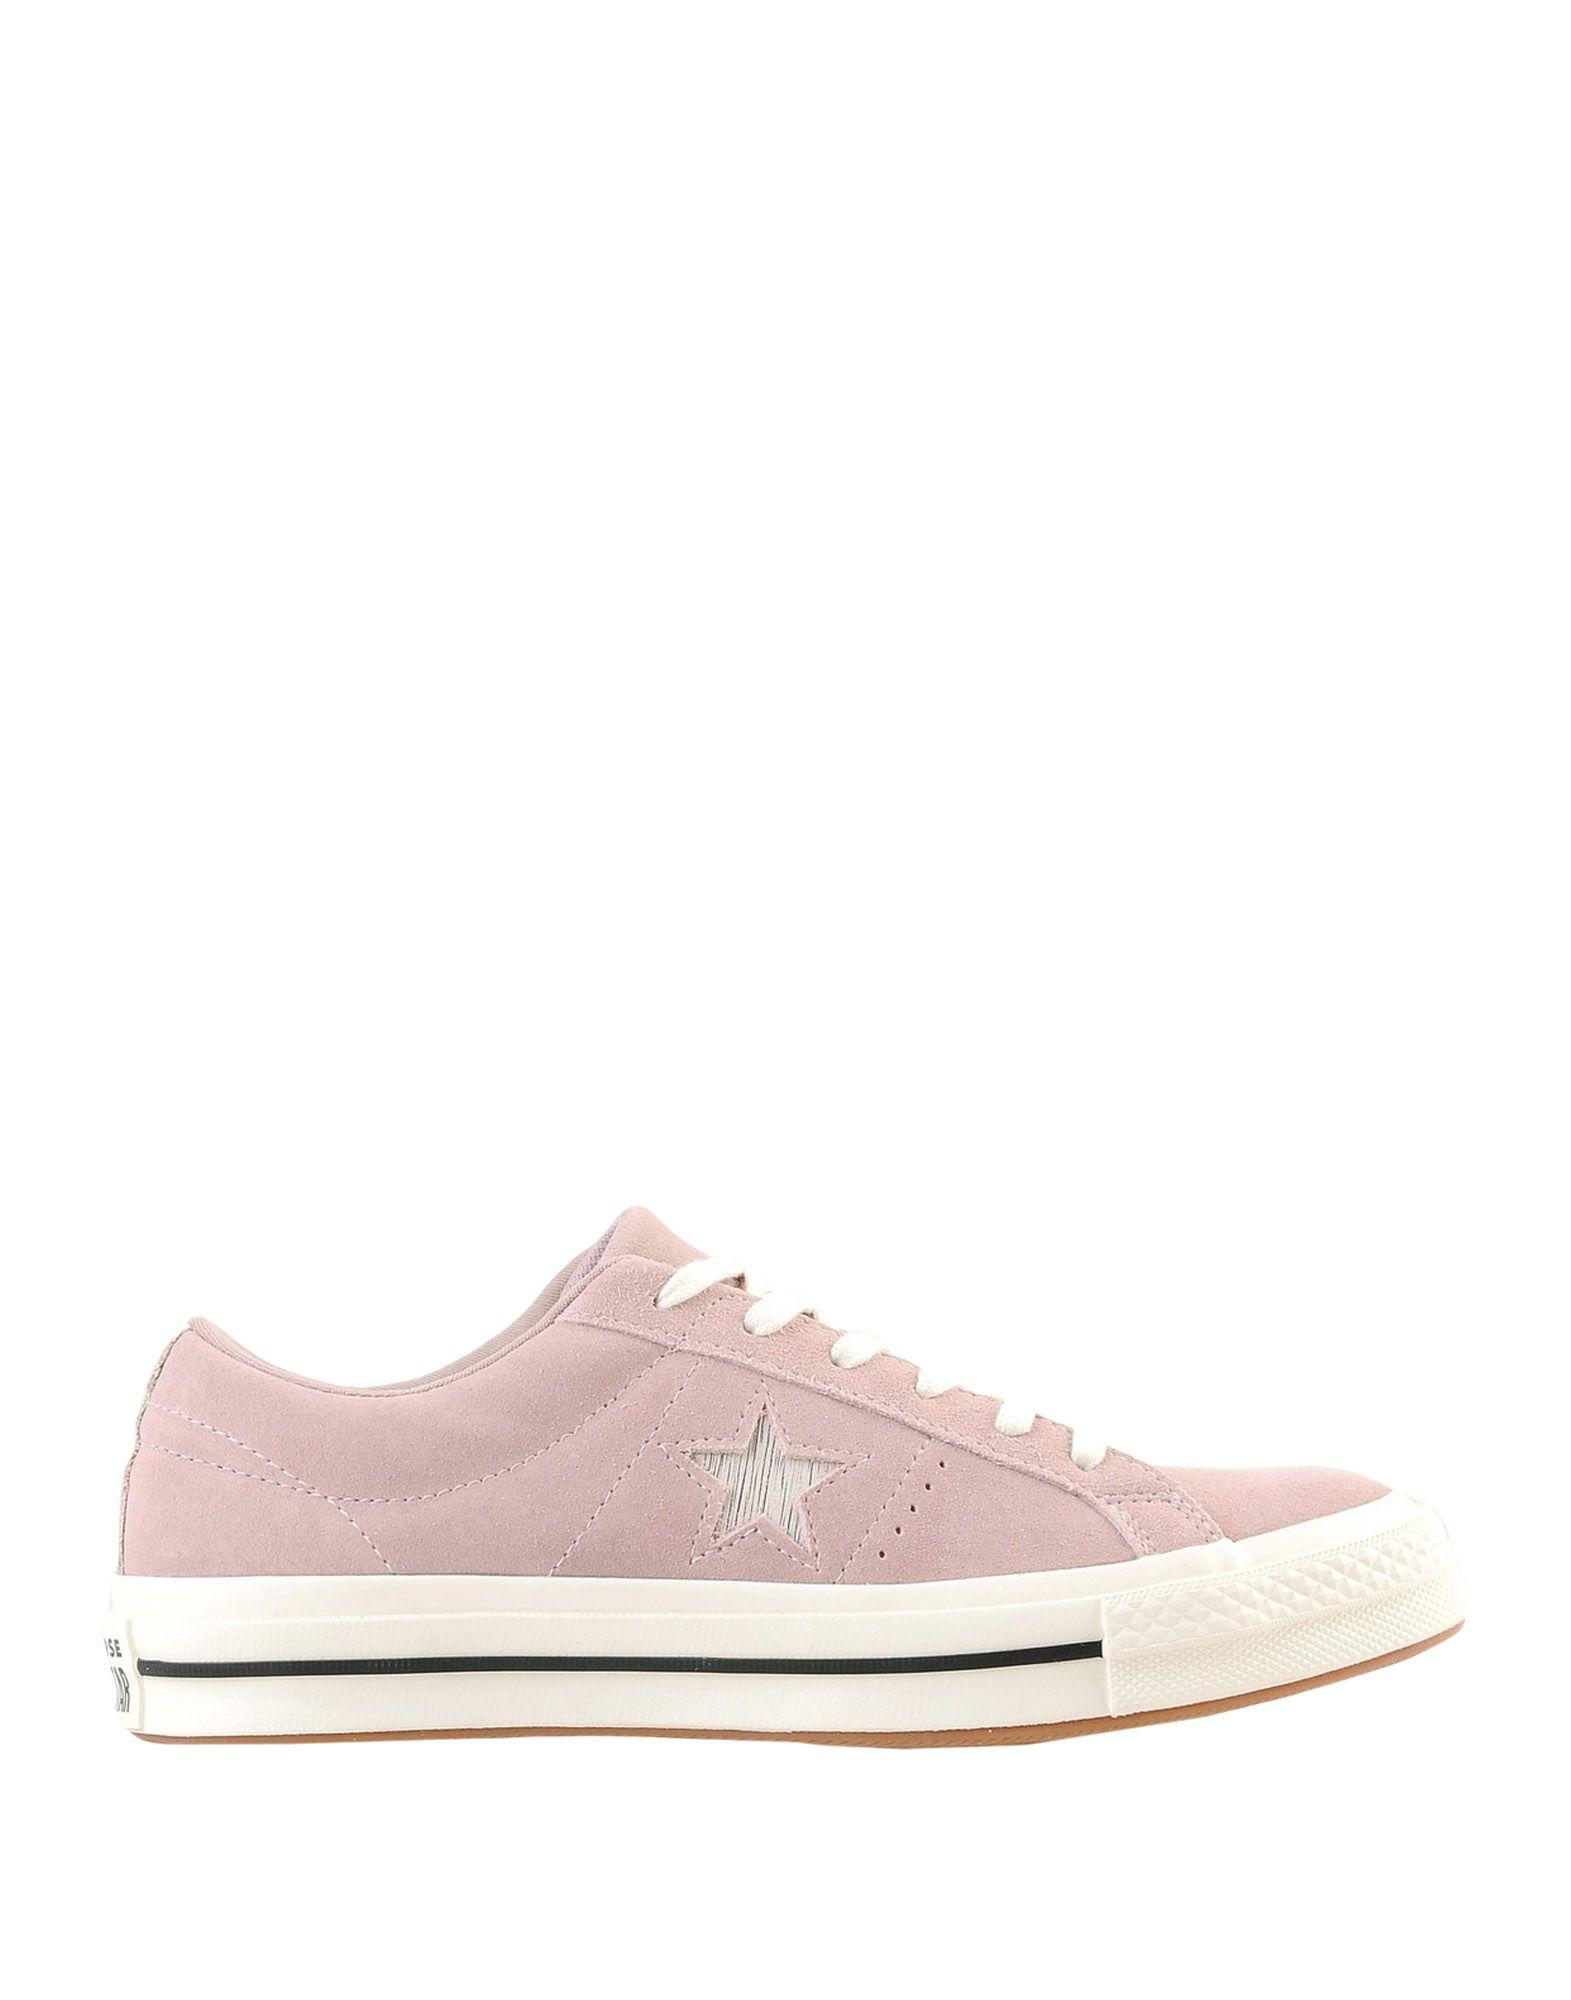 Converse One Star One Star Ox  11551779UK Gute Qualität beliebte Schuhe